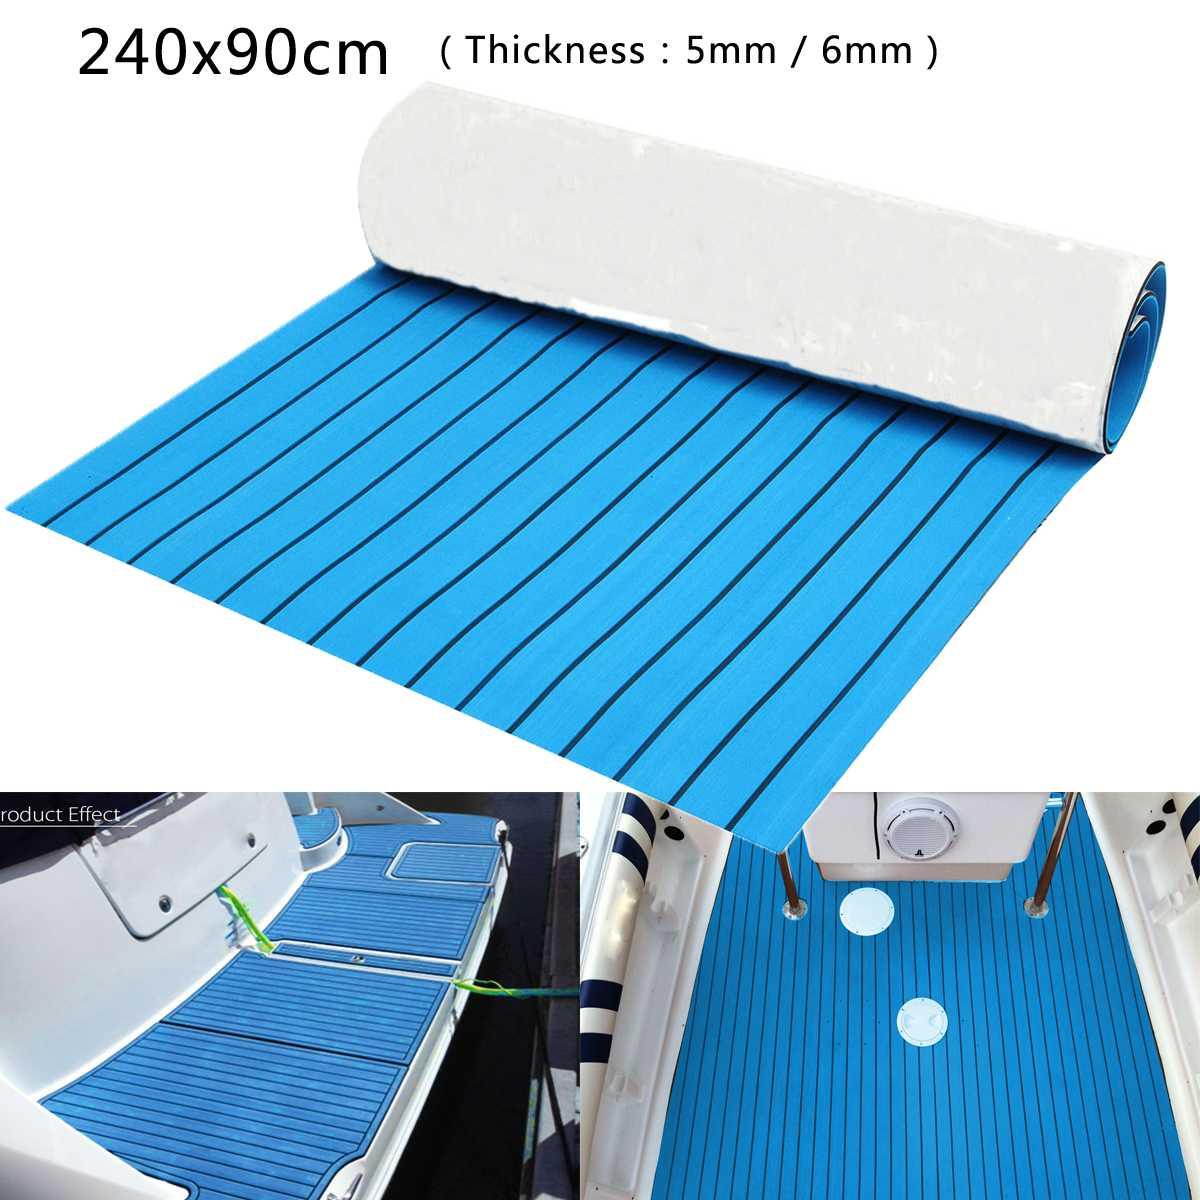 240x90cm EVA Foam 5/6mm Blue With Black Lines Boat Flooring Faux Teak Decking Sheet Pad240x90cm EVA Foam 5/6mm Blue With Black Lines Boat Flooring Faux Teak Decking Sheet Pad